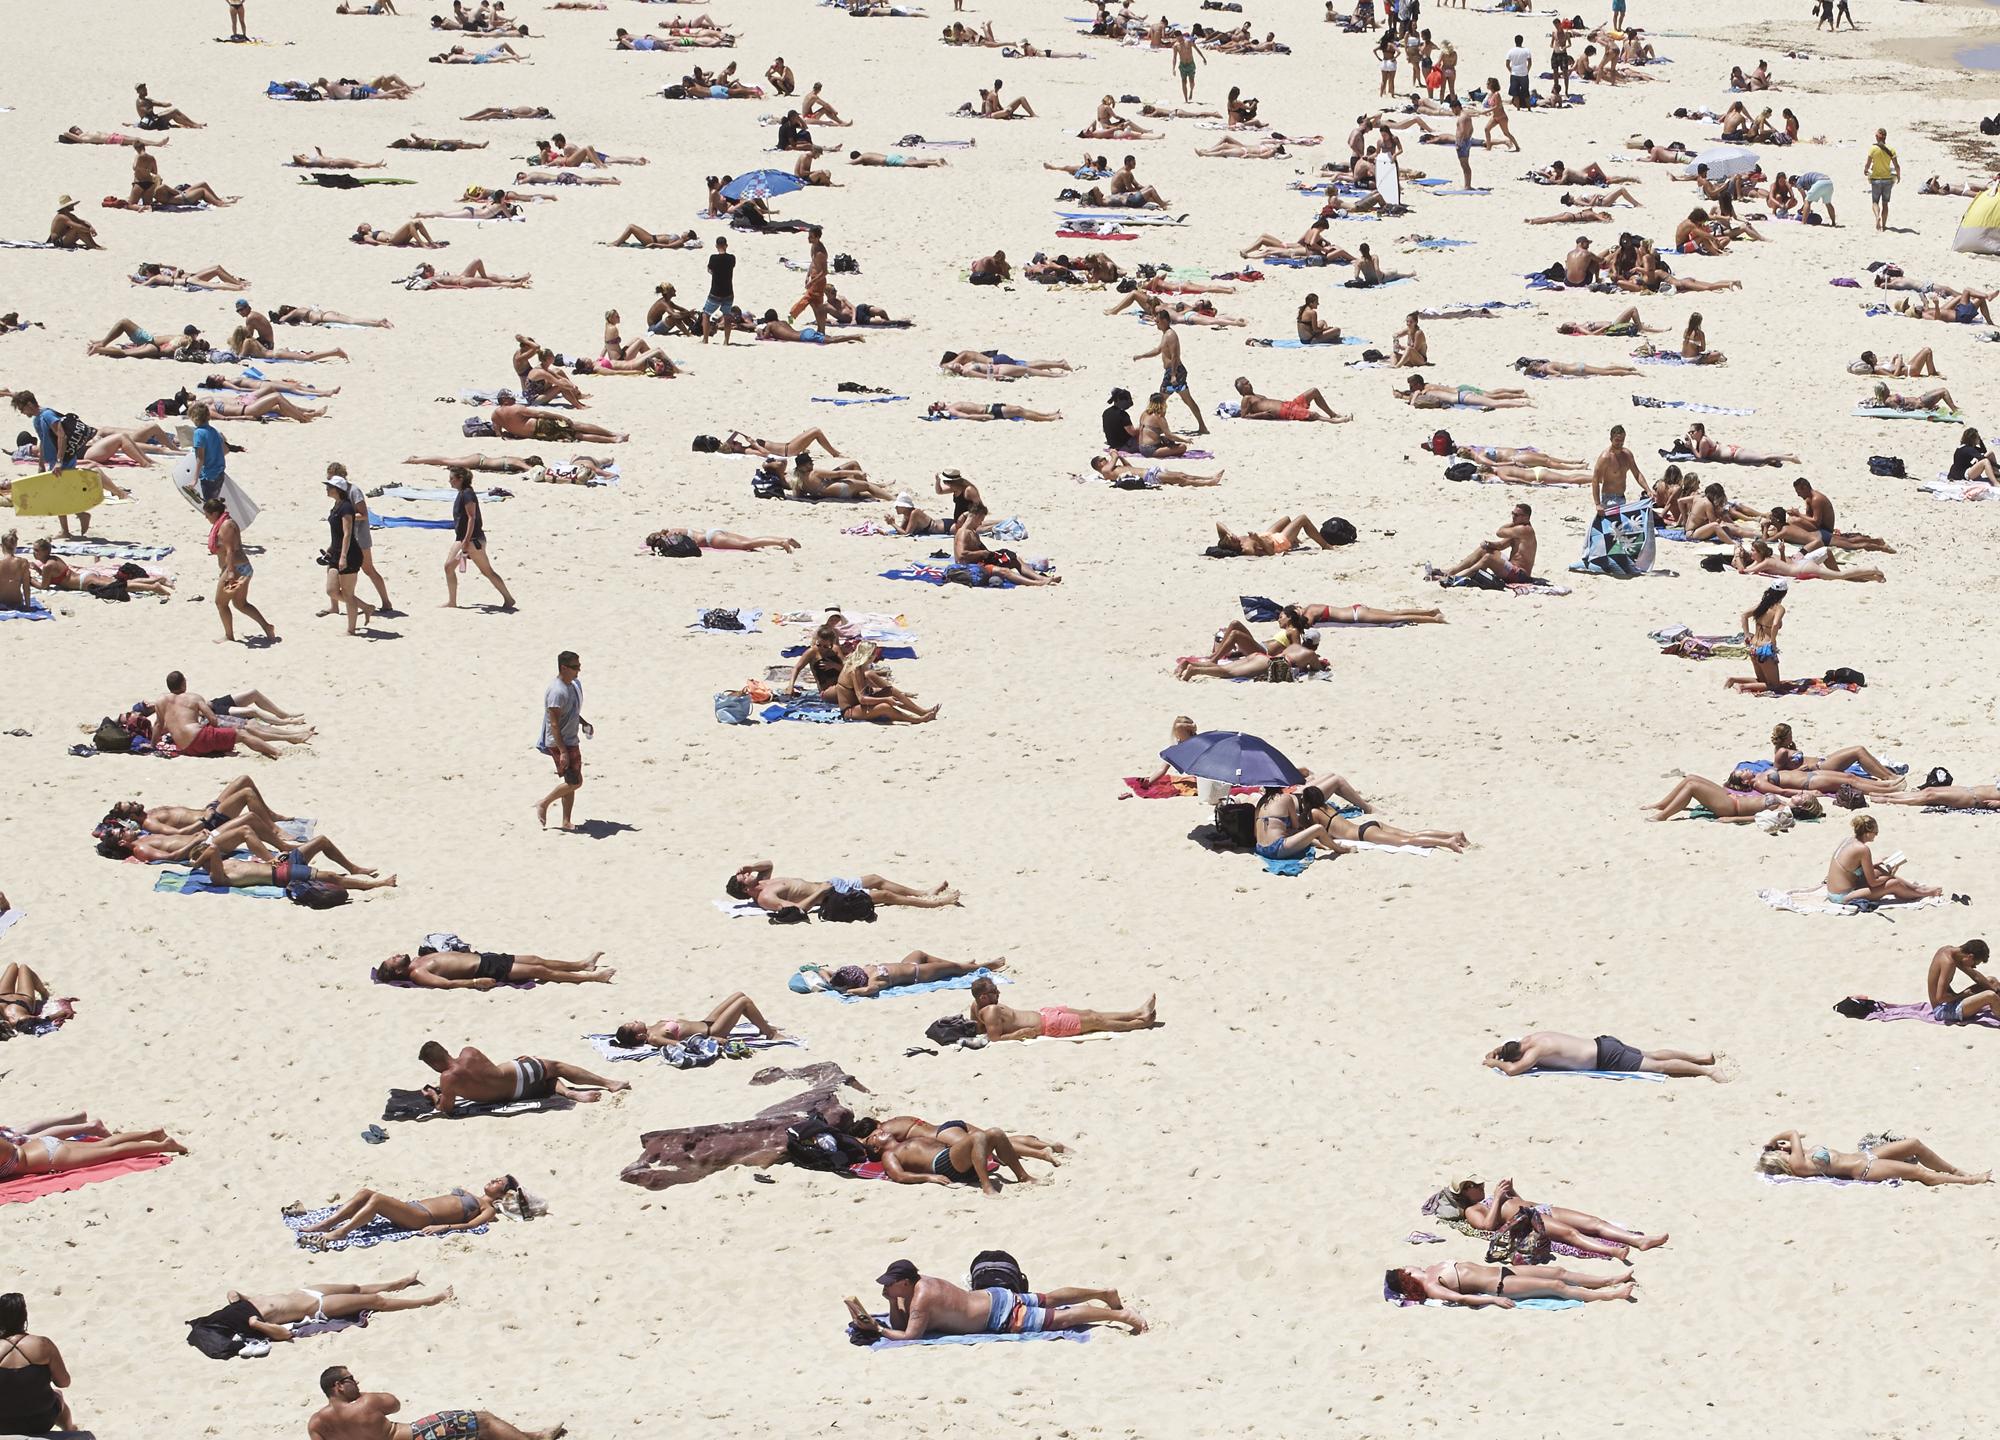 Grant Smith - Bondi Beach